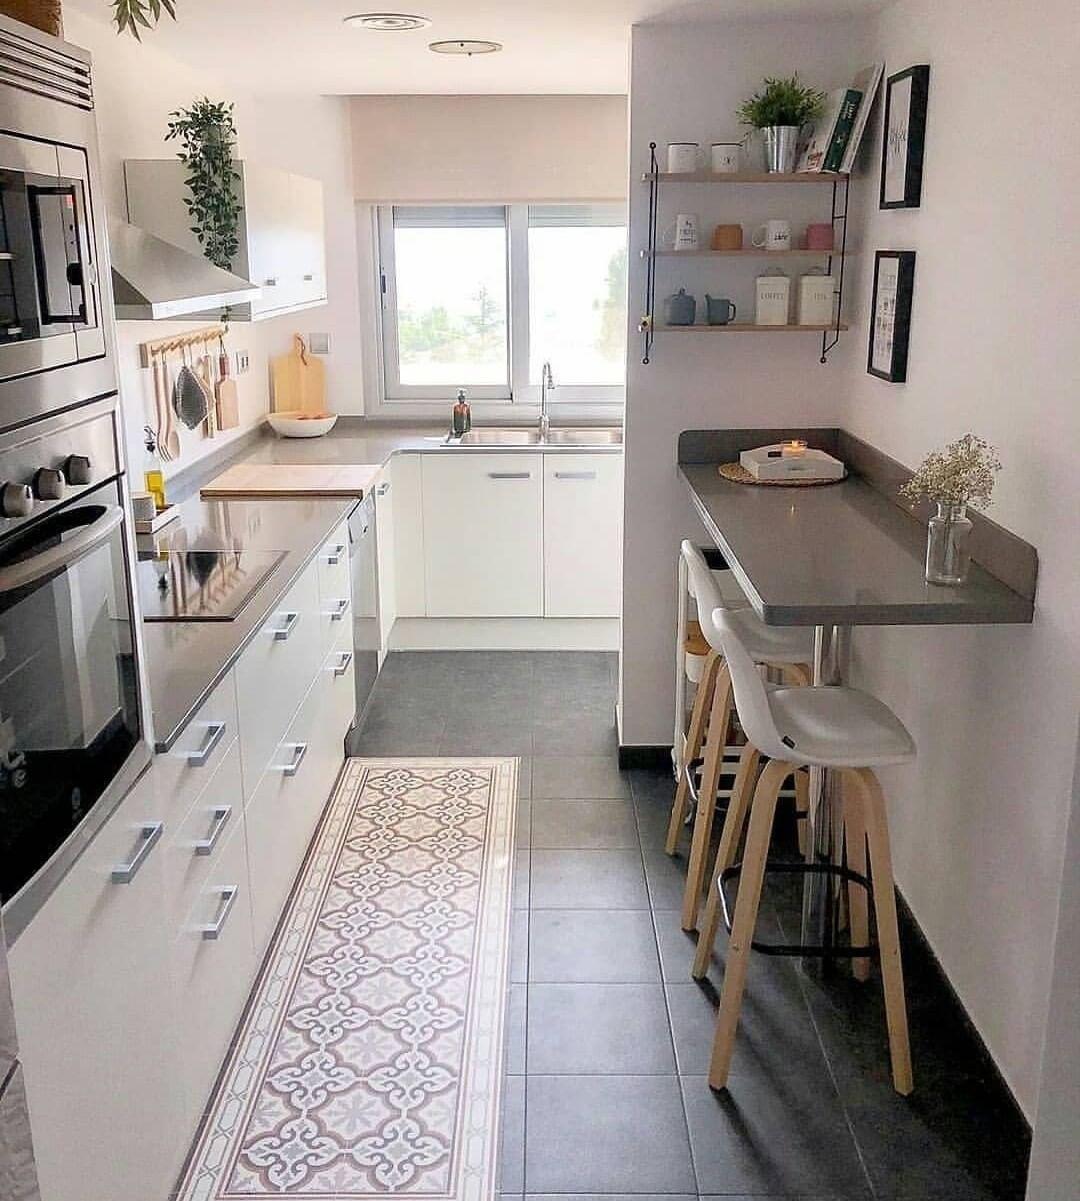 Desain Interior Dapur Minimalis dan Ada Bar Mininya dengan Gaya